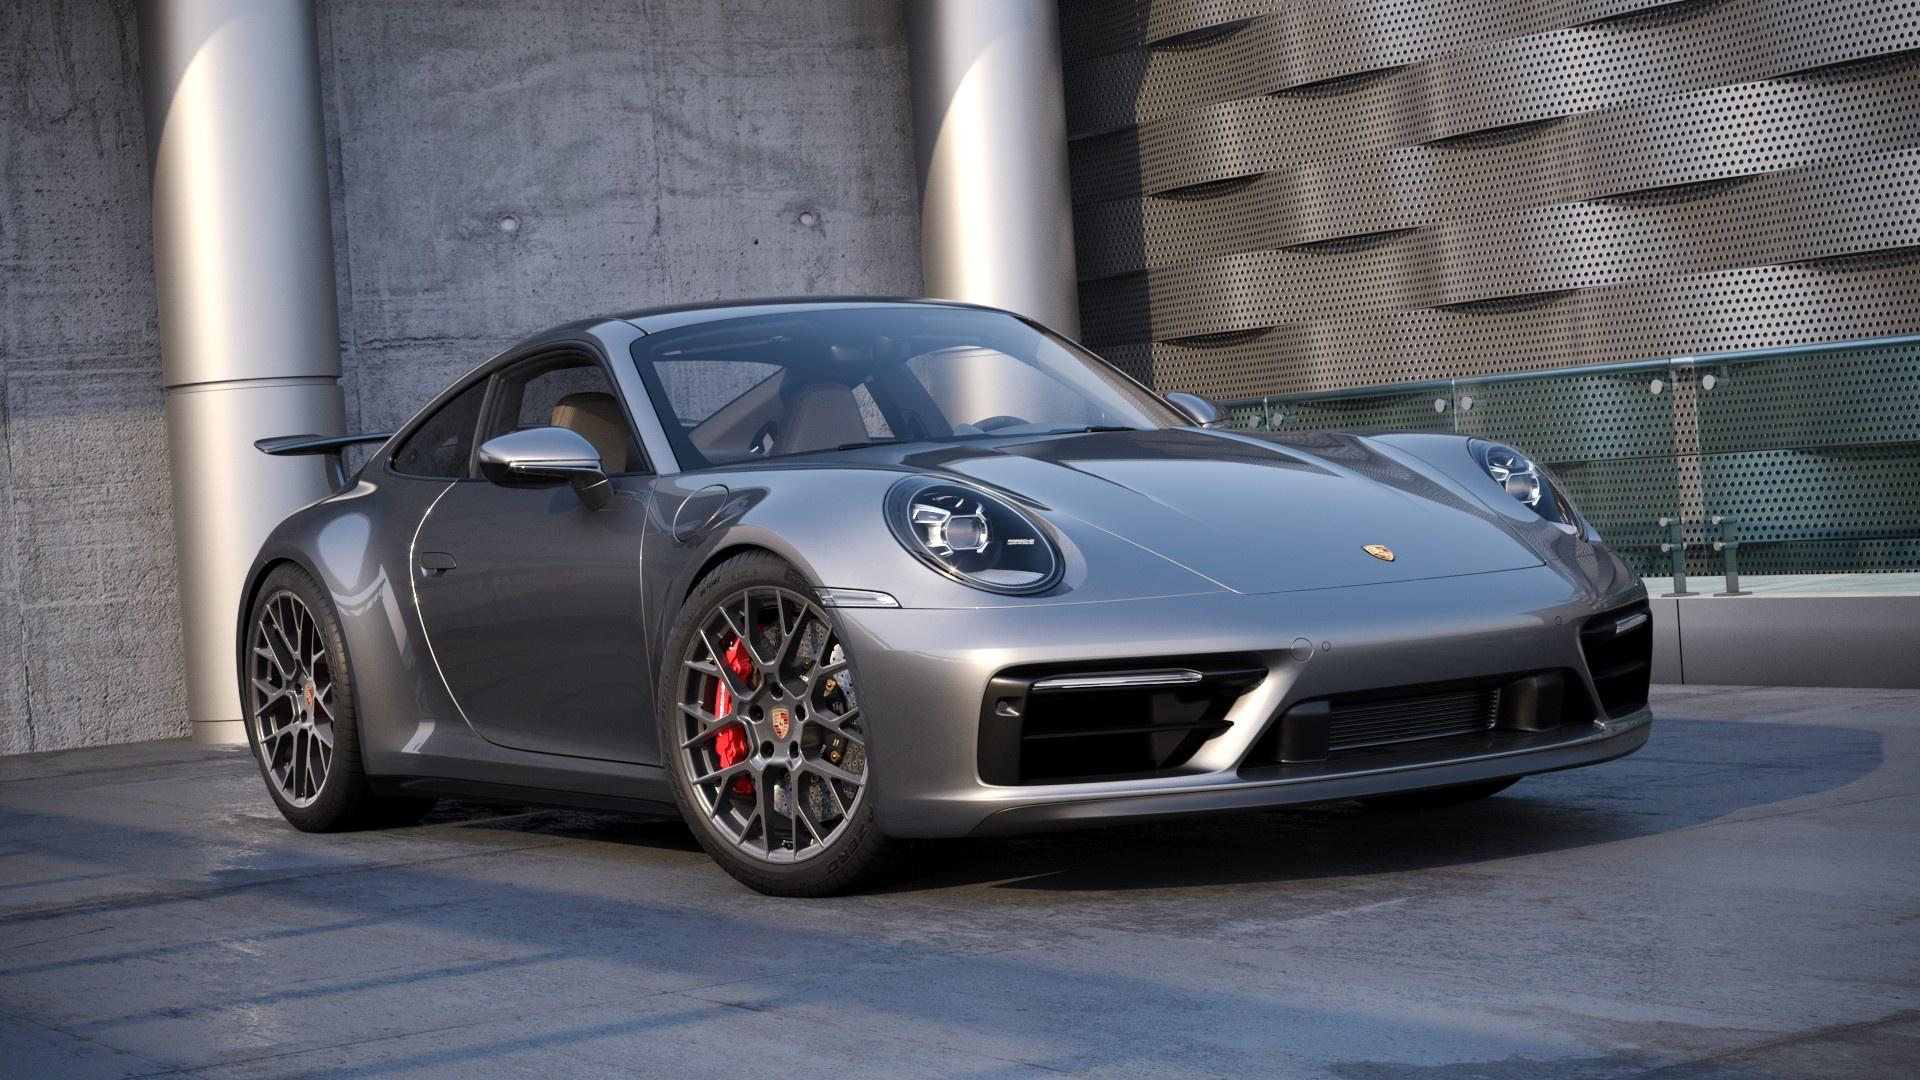 Vehicles Porsche 911 Carrera Porsche Car Porsche 911 Vehicle 1920x1080